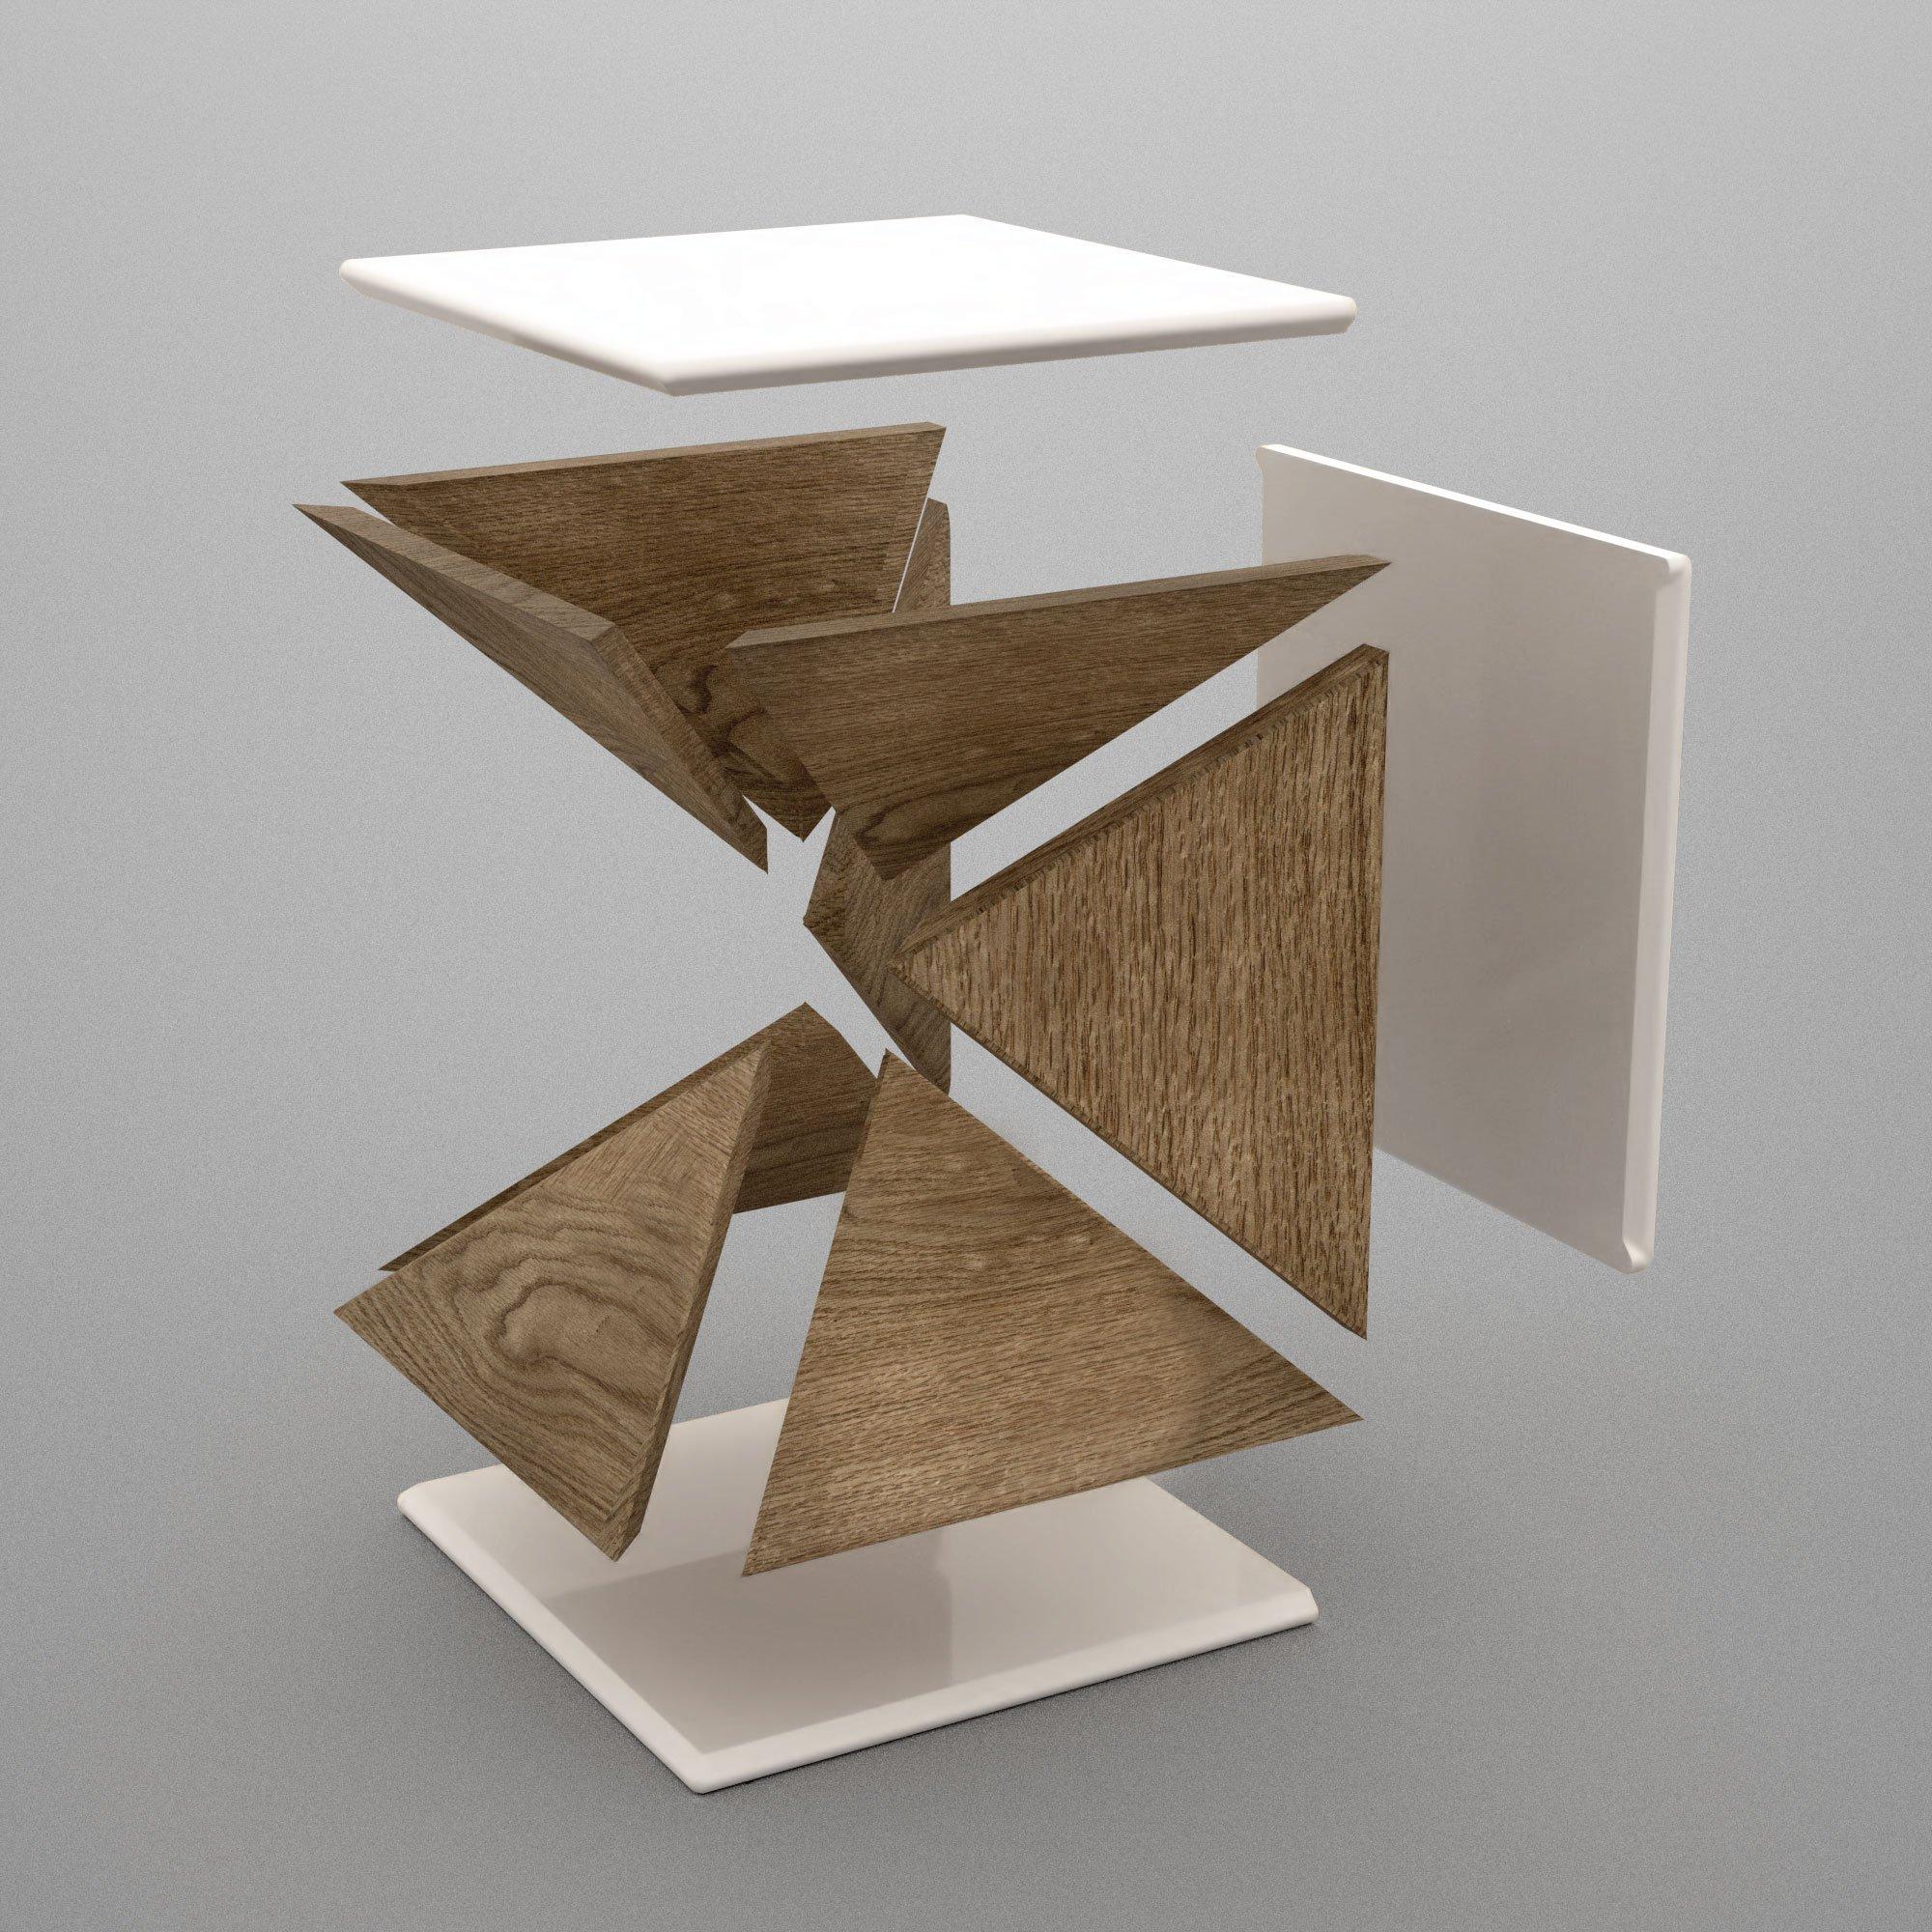 qbico-whitewood-explode-marcellocannarsa-product-designer